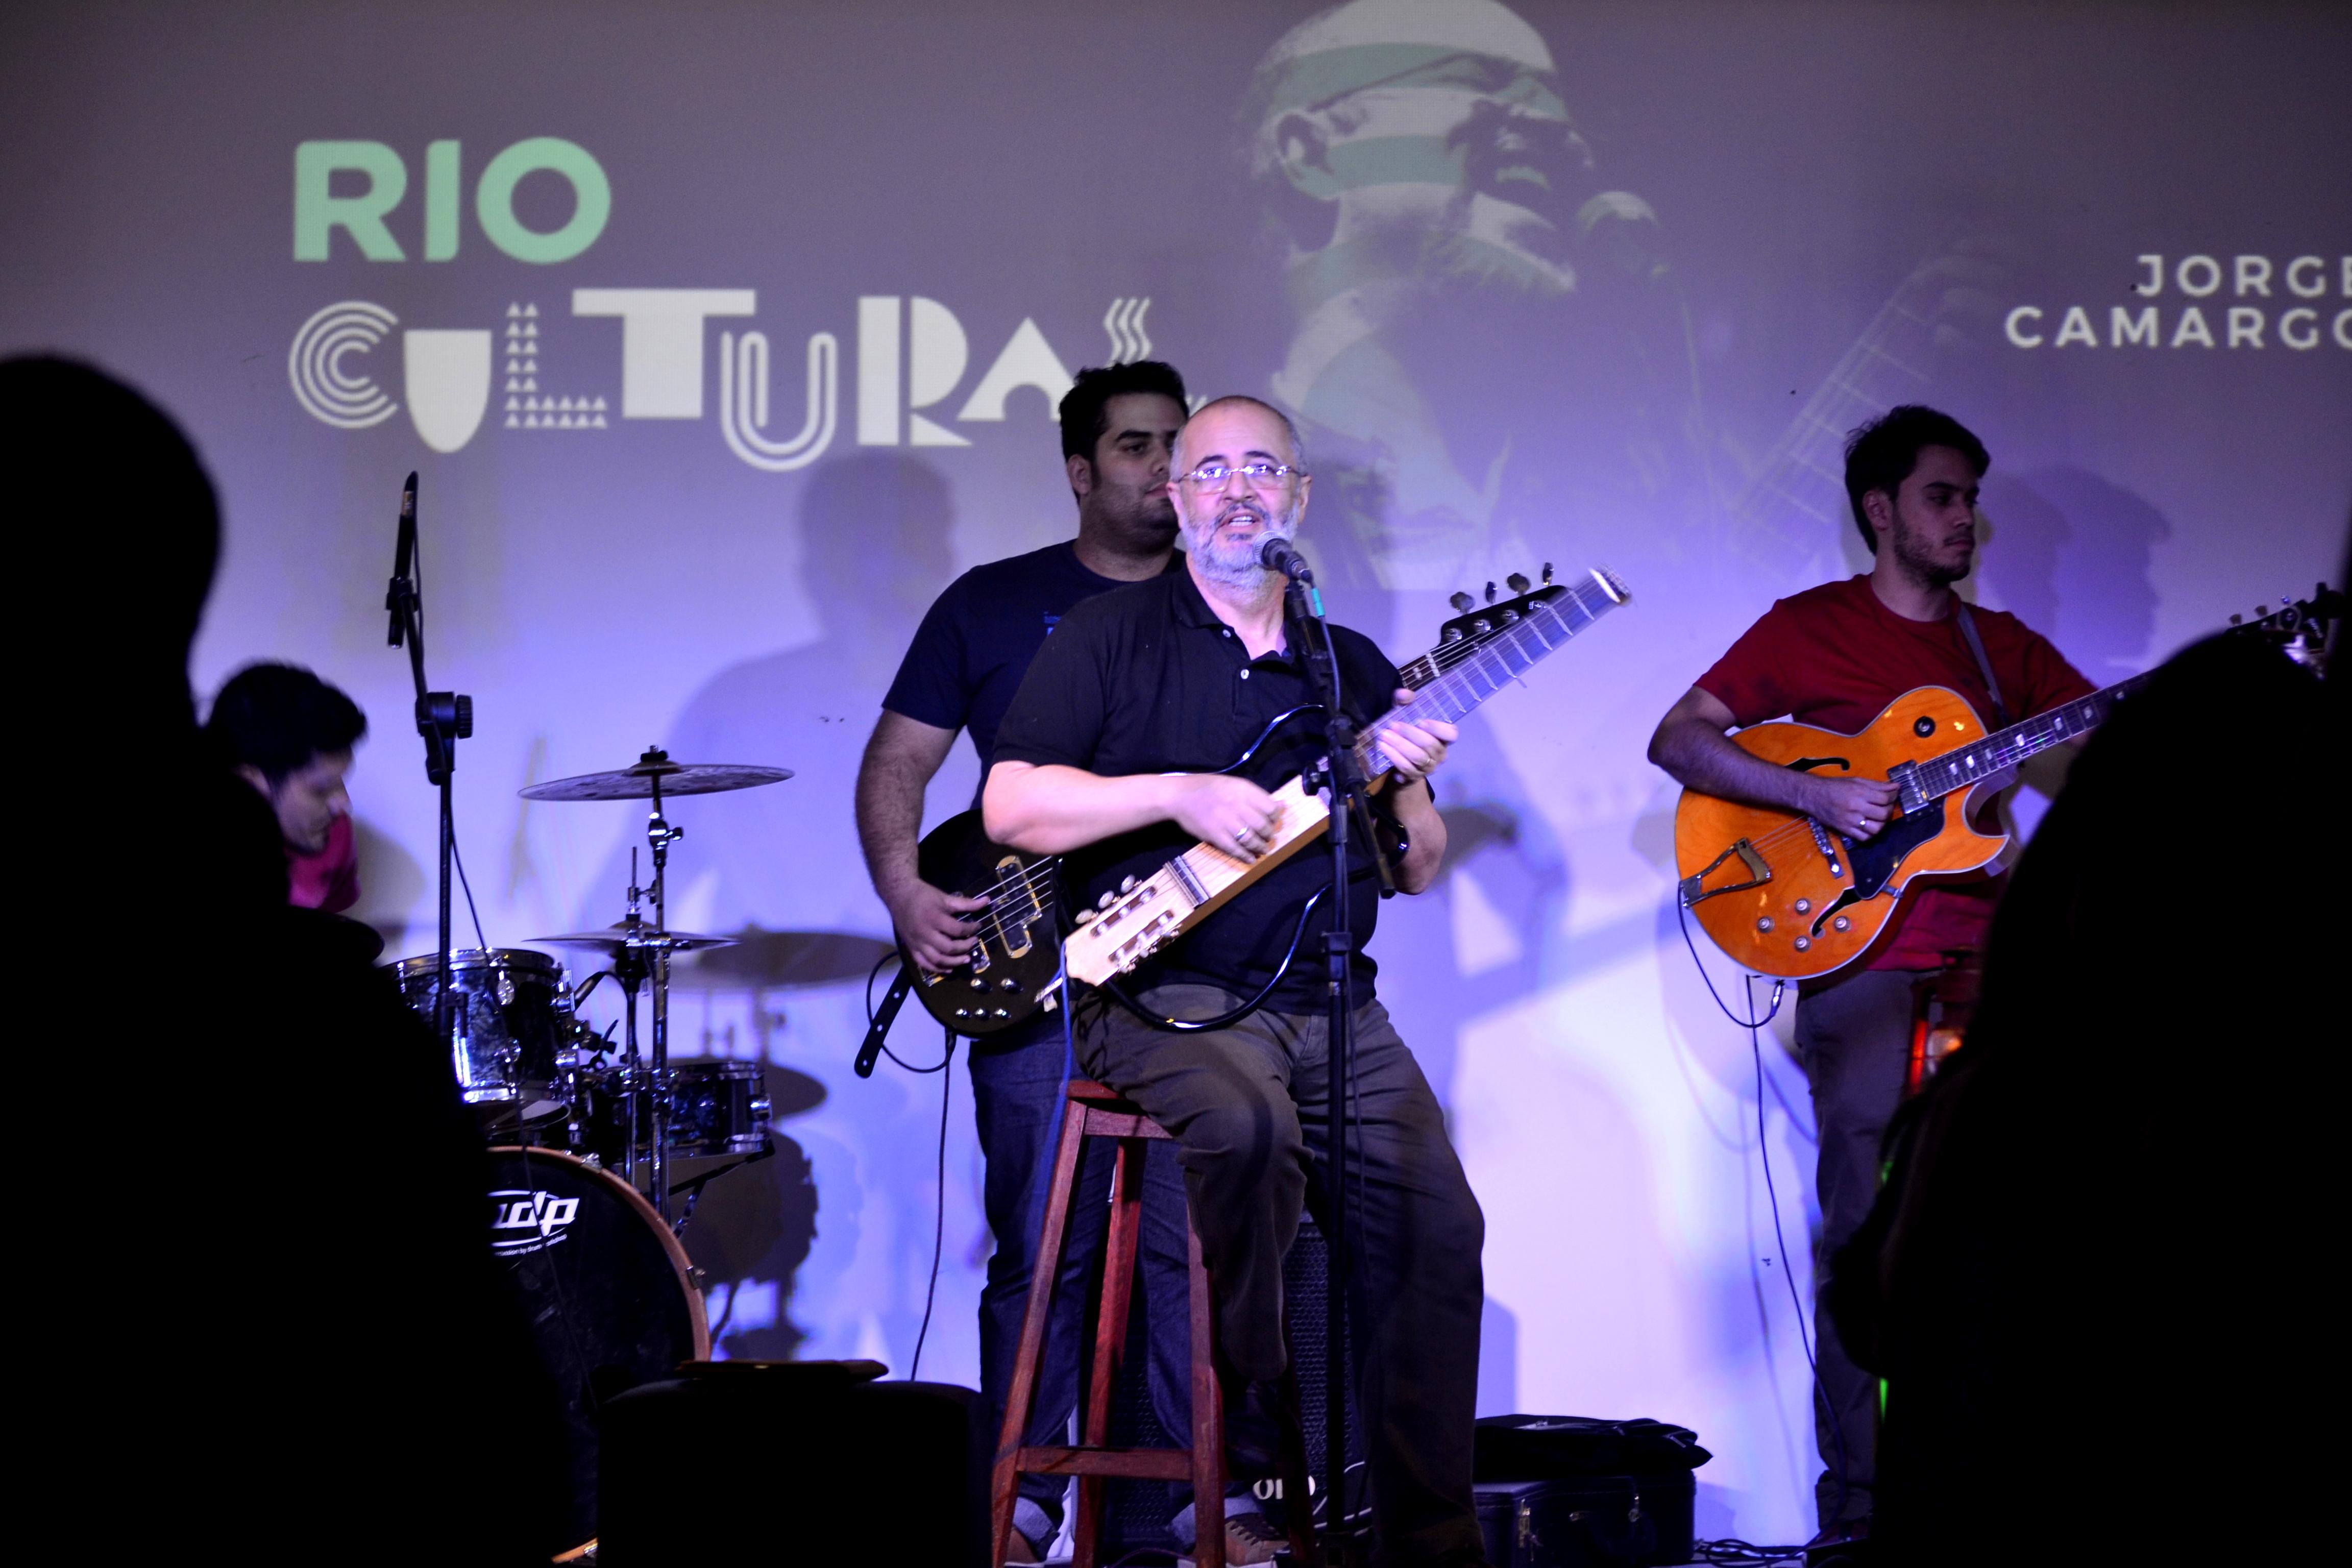 Rio Cultural 3